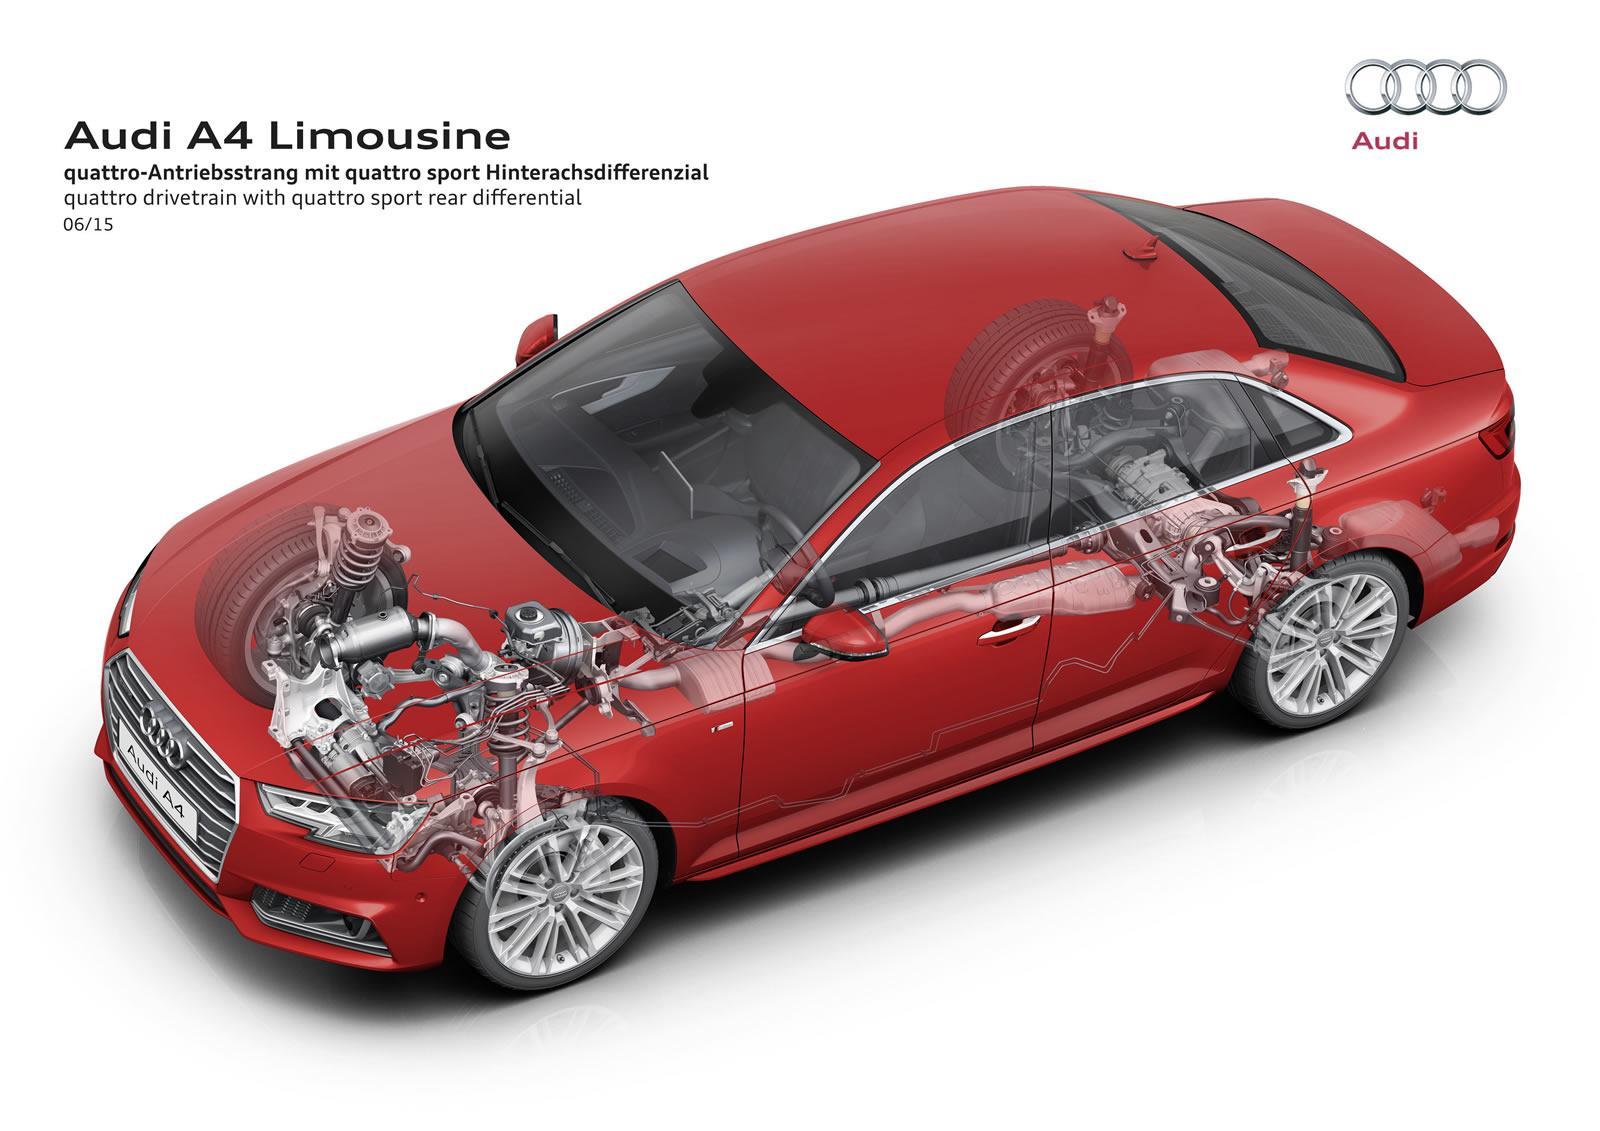 2017 Audi A4 Debuts on U.S. Soil, Starts at $37,300 - autoevolution